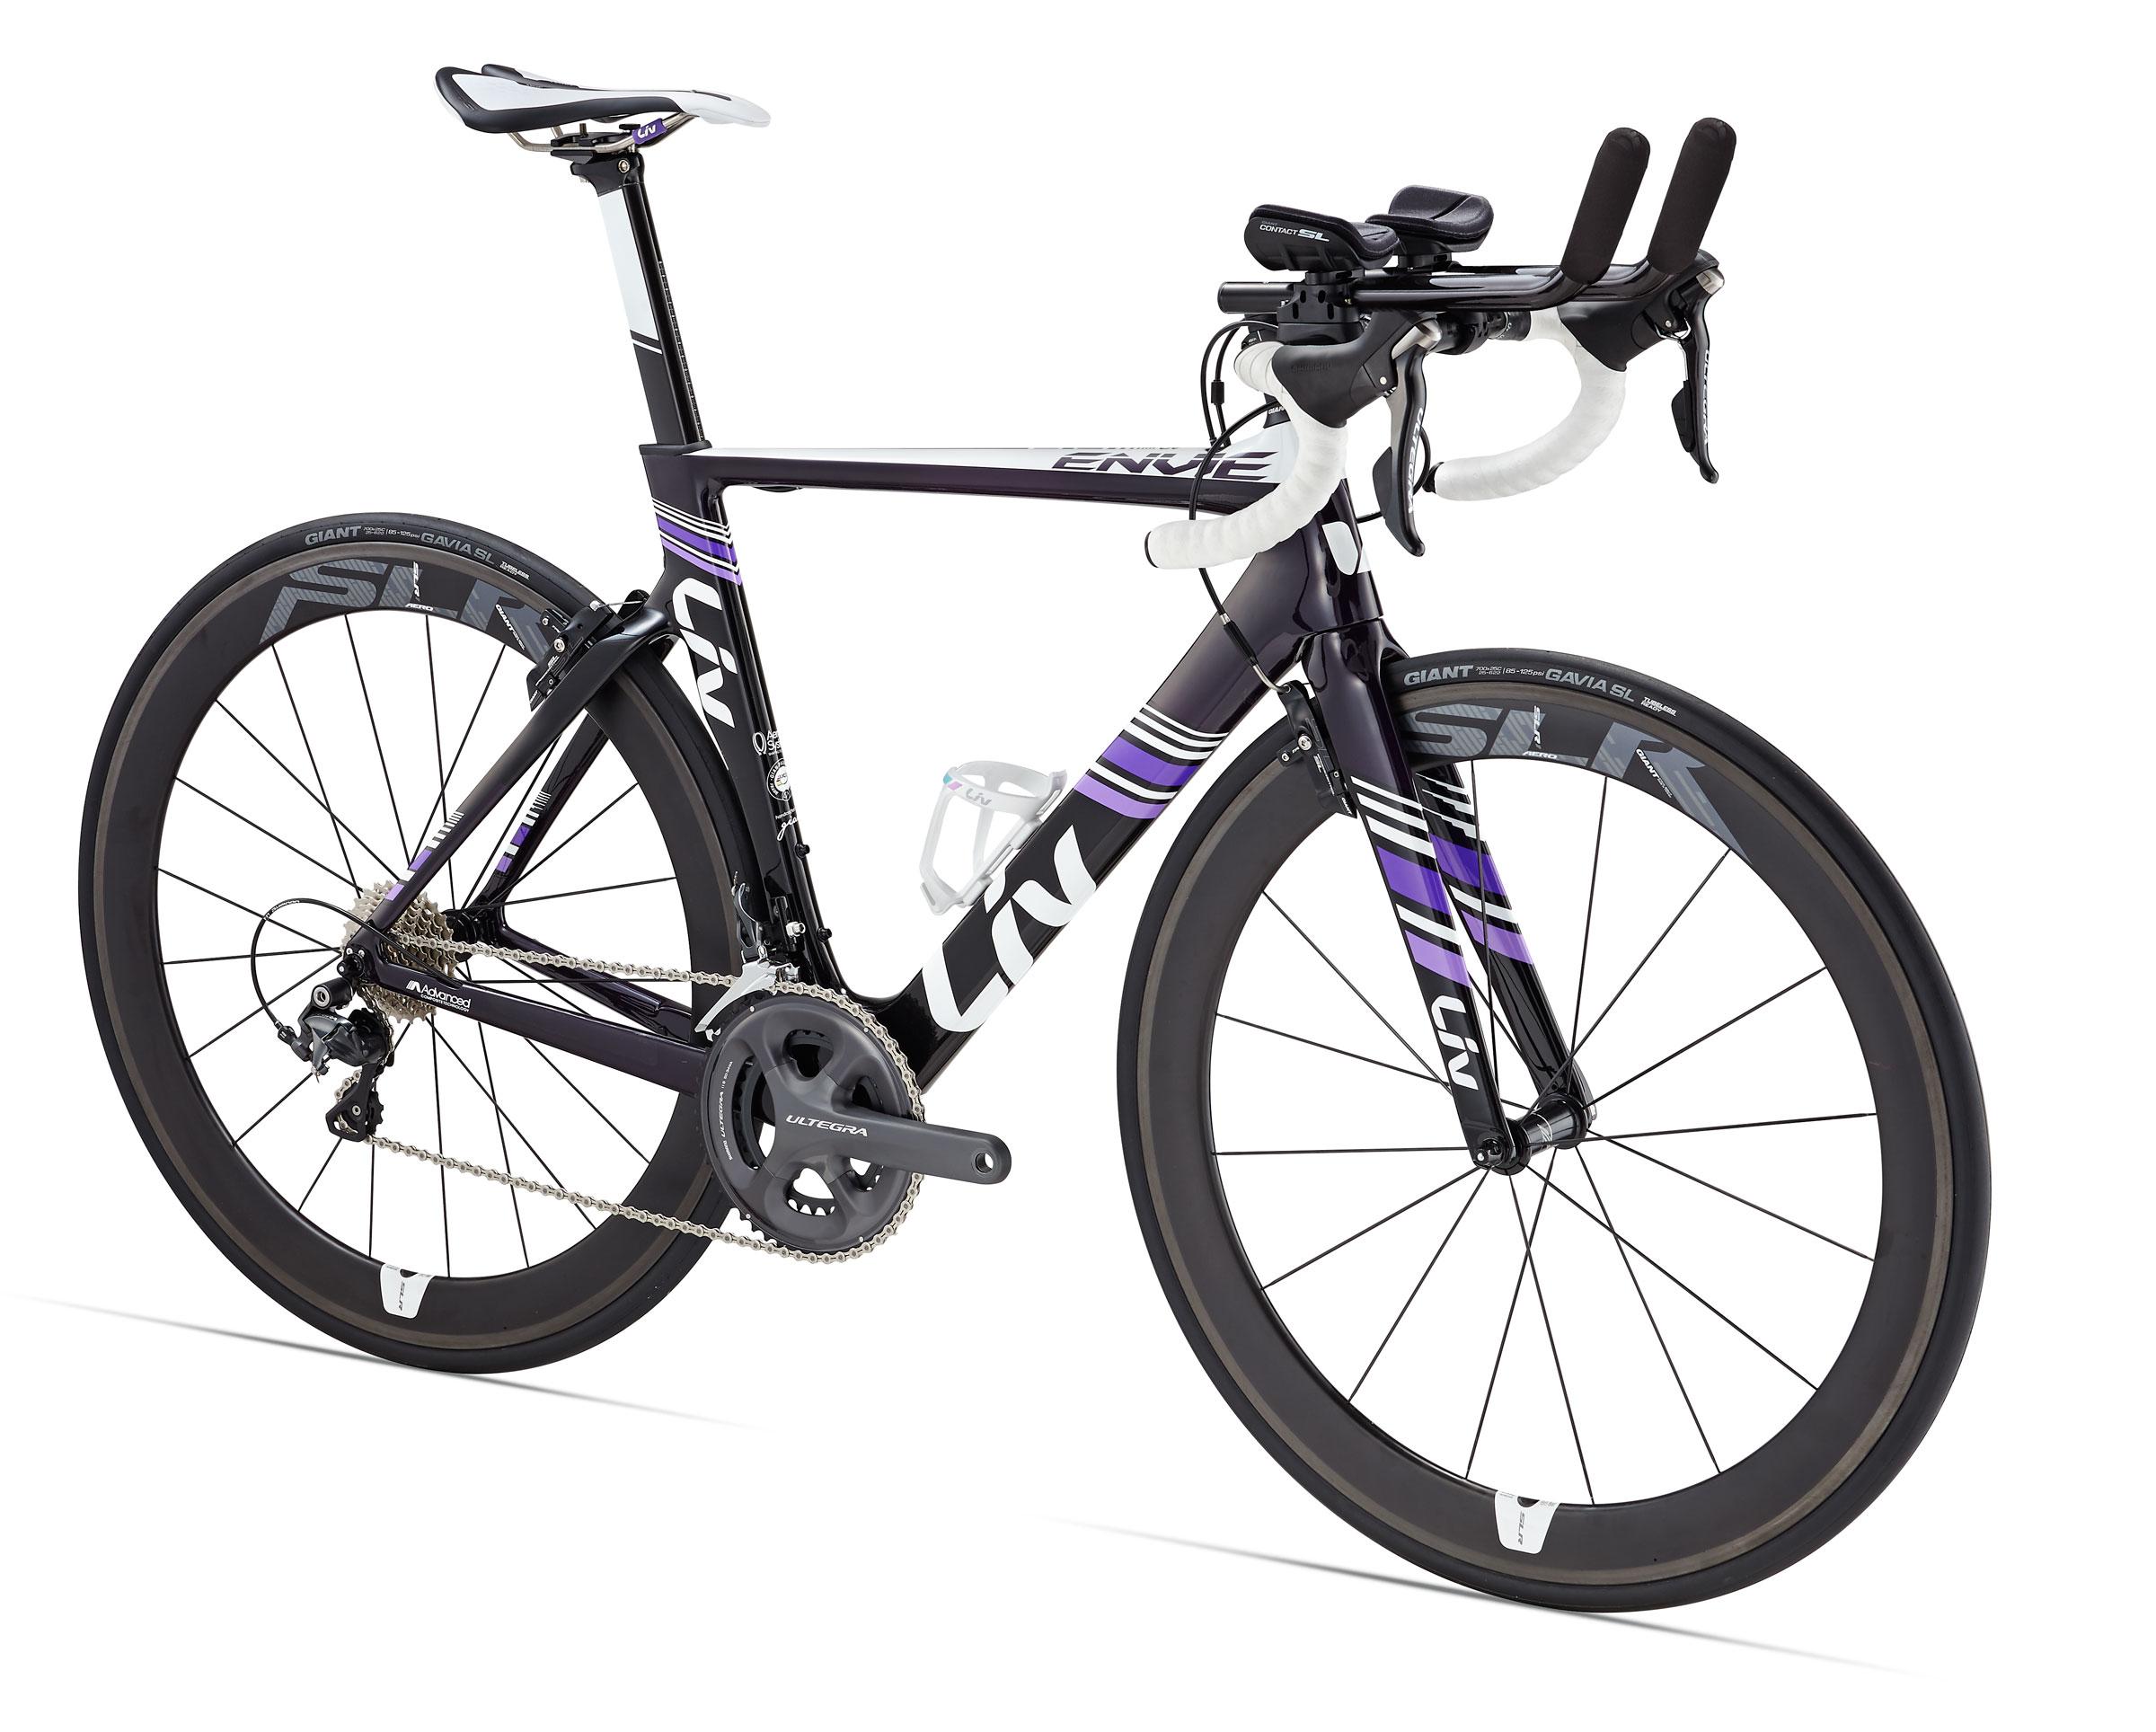 92c14a924c8 Liv Envie Advanced 1 Tri - Spokes Wheaton IL Naperville Pro Bike Fitting  Custom Bike Builds